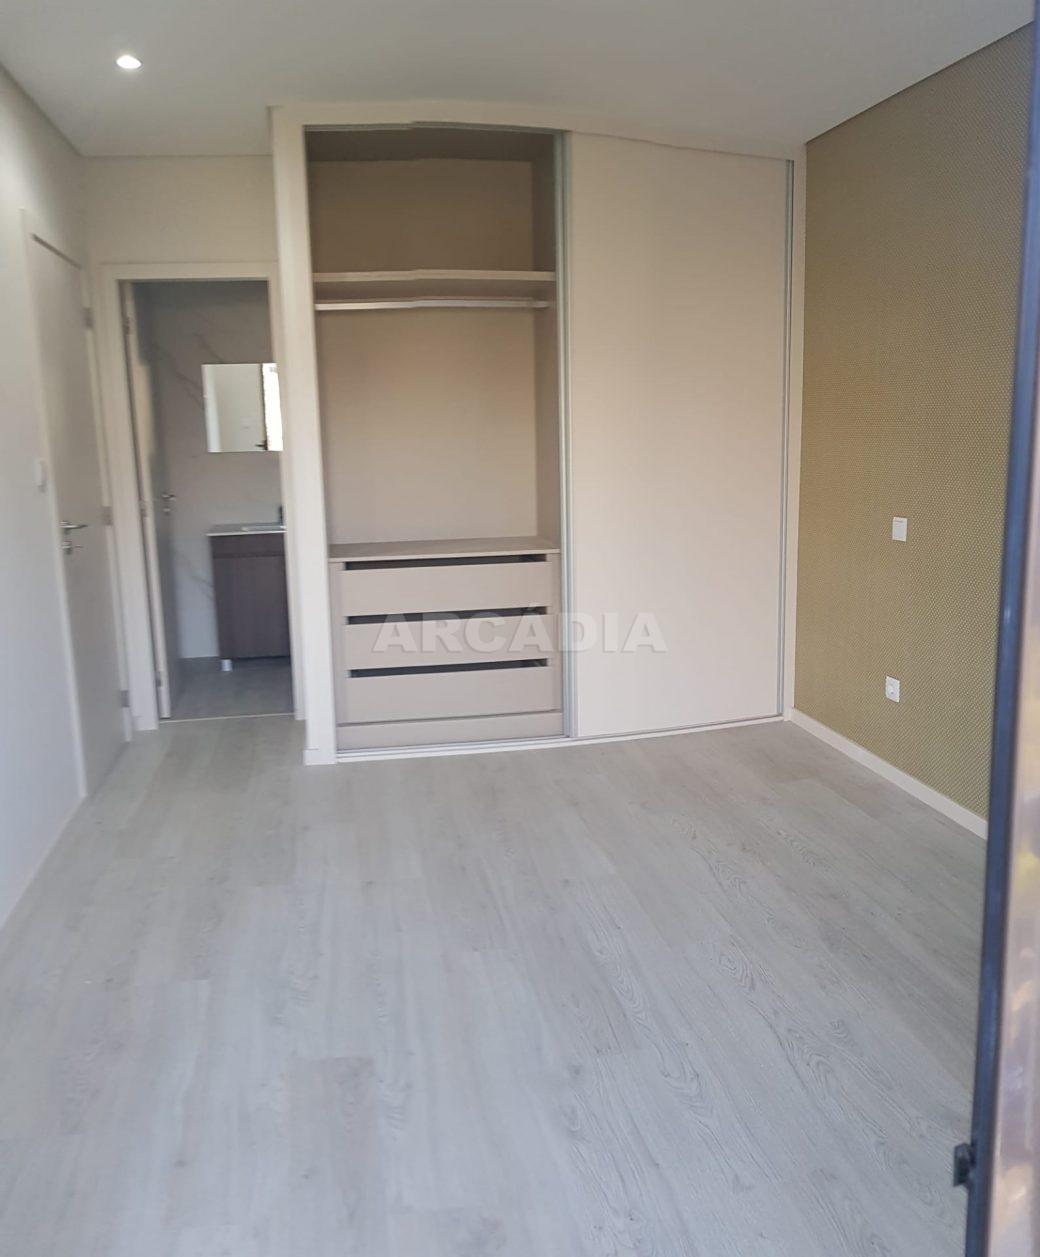 arcadia-imobiliaria-braga-apartamento-tipo-3-arrendamento-sao-lazaro-remodelado-excelente-preco-unica-oportunidade7